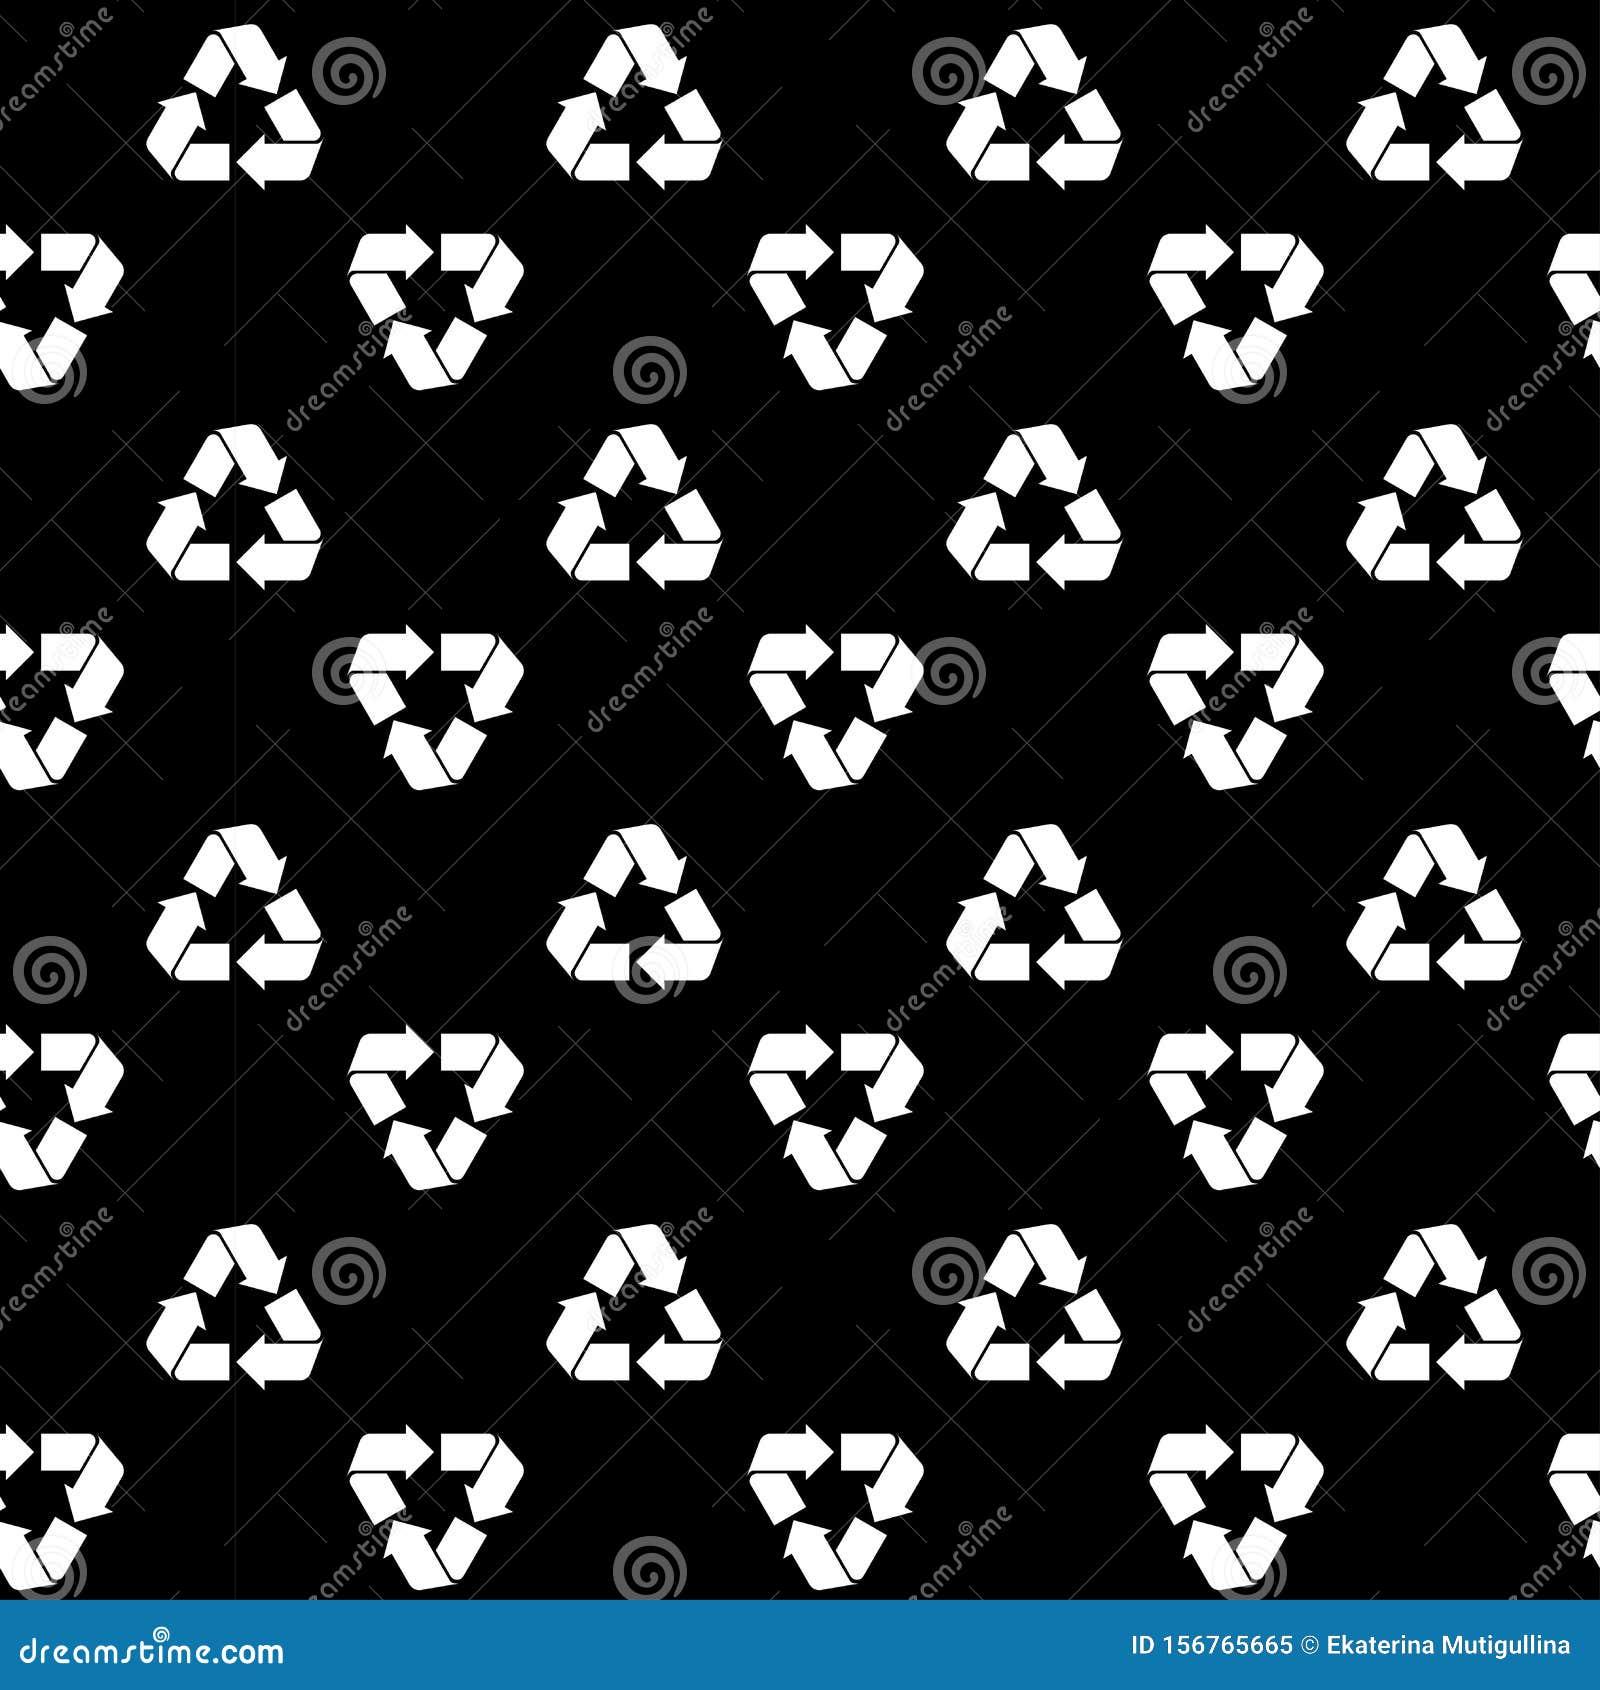 Seamless recycling pattern black